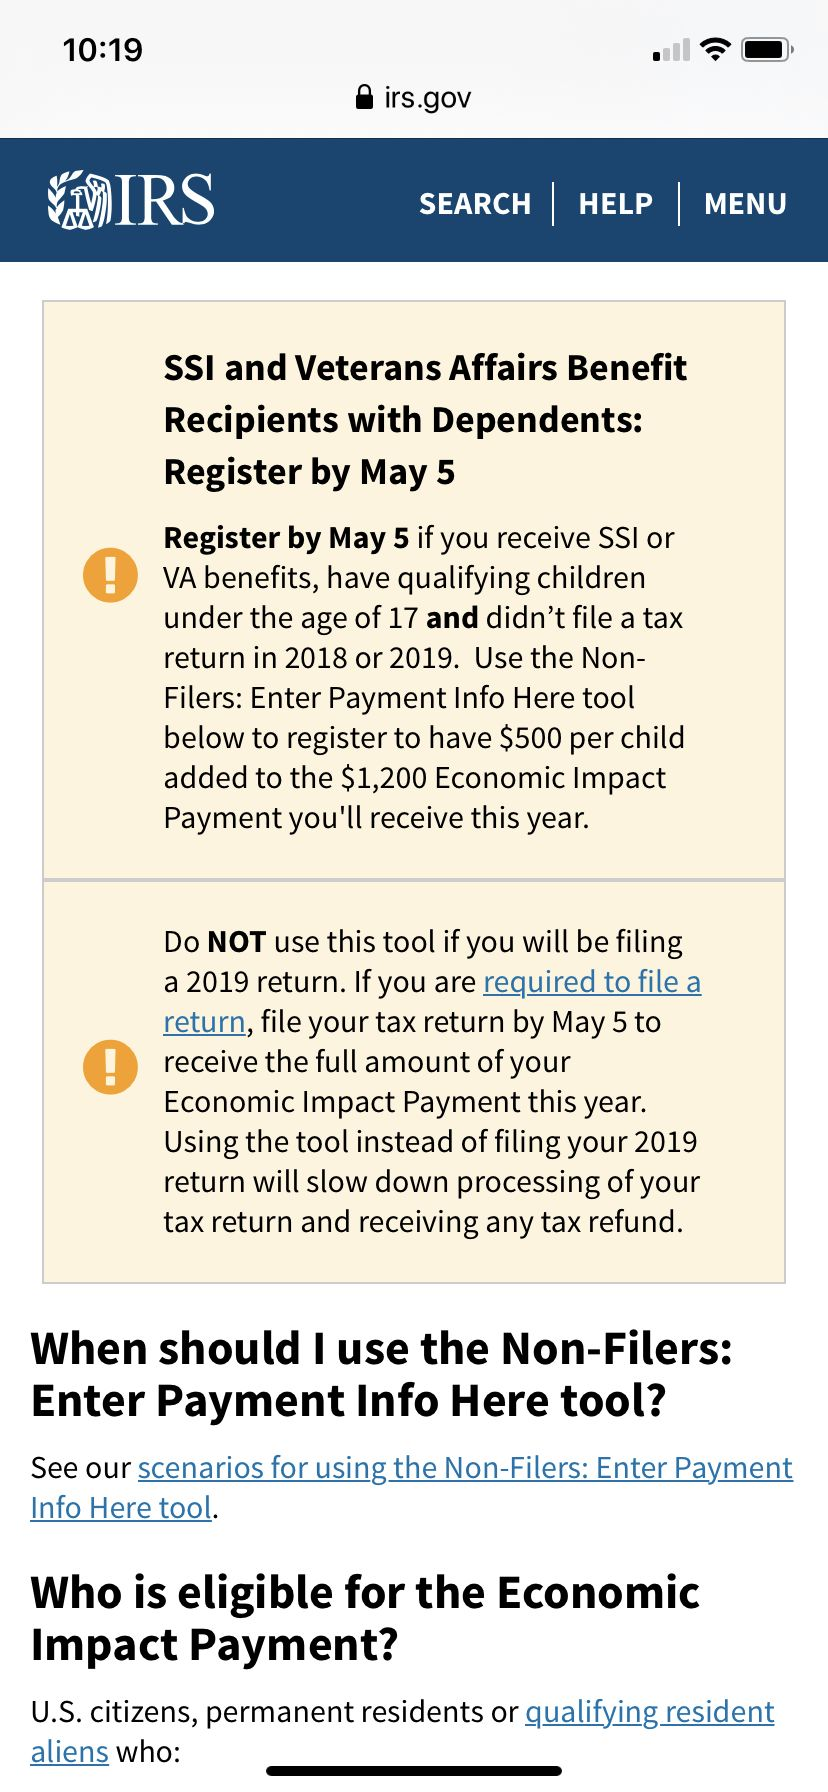 ad533470c7faa0e501152c7fac5622dc - How Long Does It Take To Get Child Tax